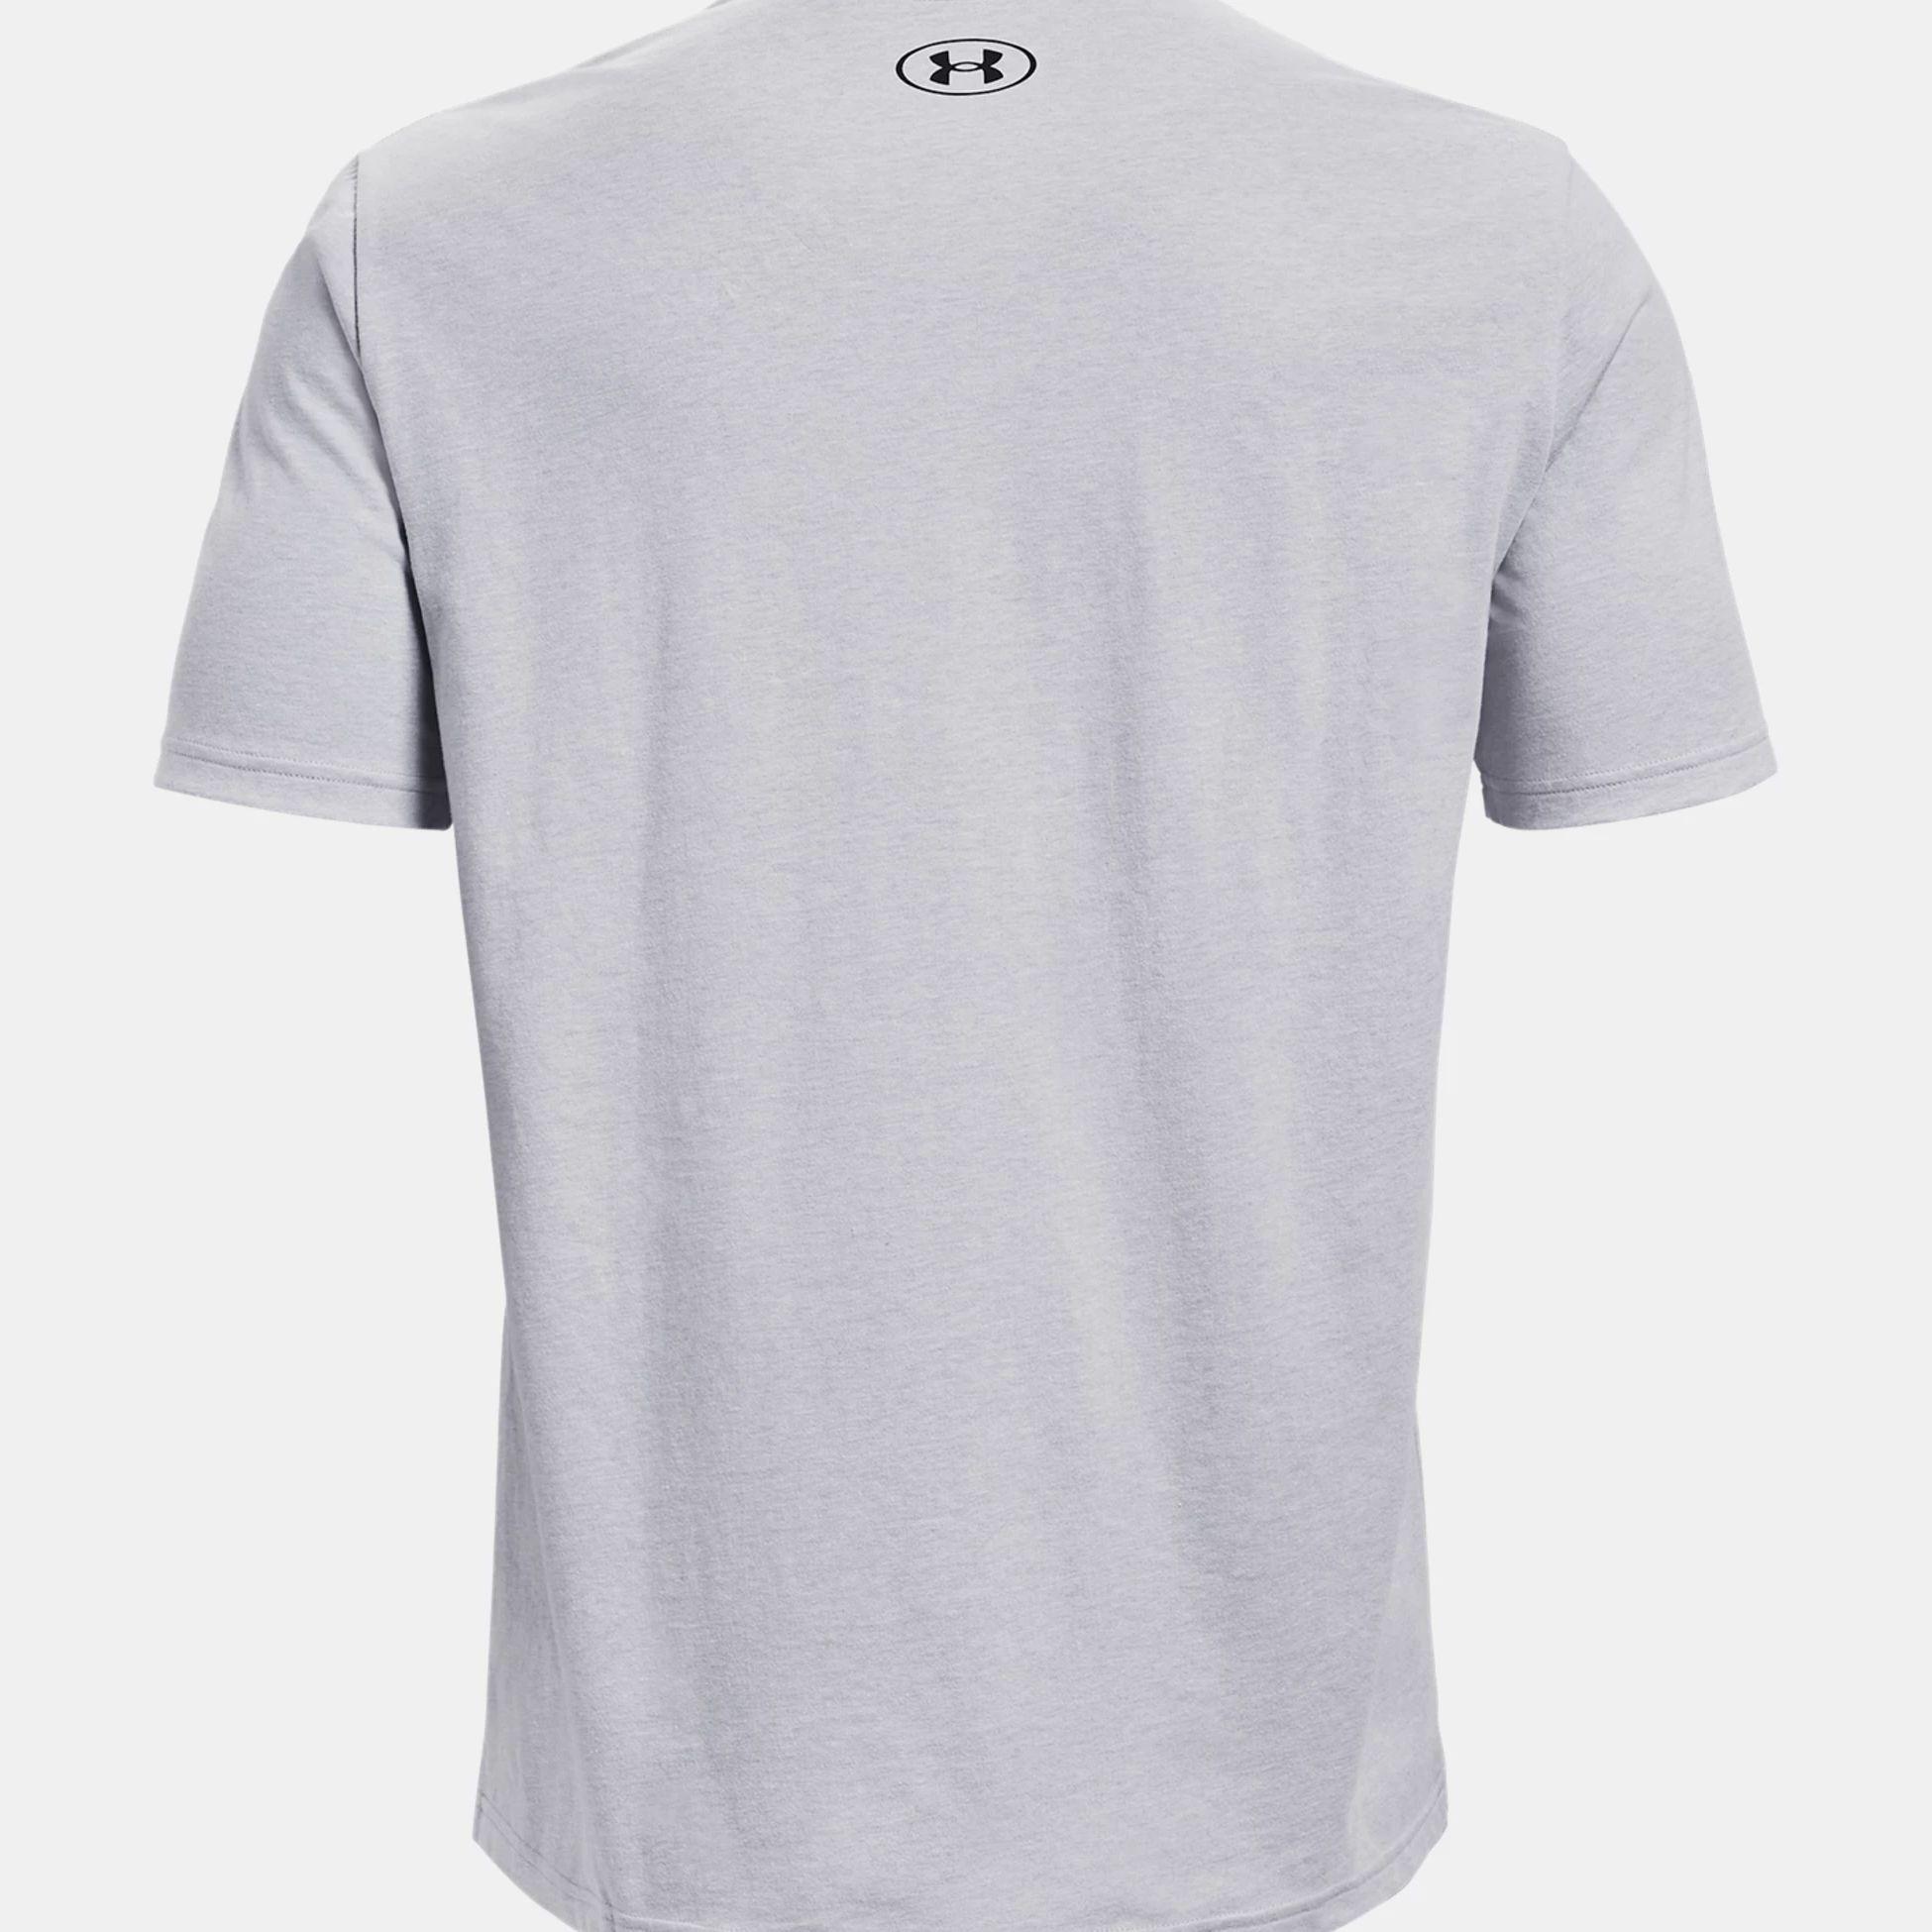 Îmbrăcăminte -  under armour UA ABC Camo Boxed Logo SS 1673